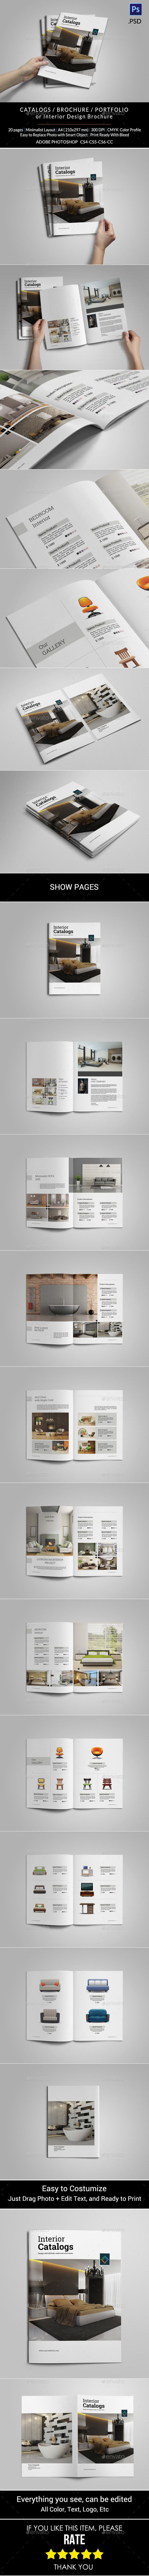 Catalogs / Brochure - Catalogs Brochures                                                                                                                                                                                 More